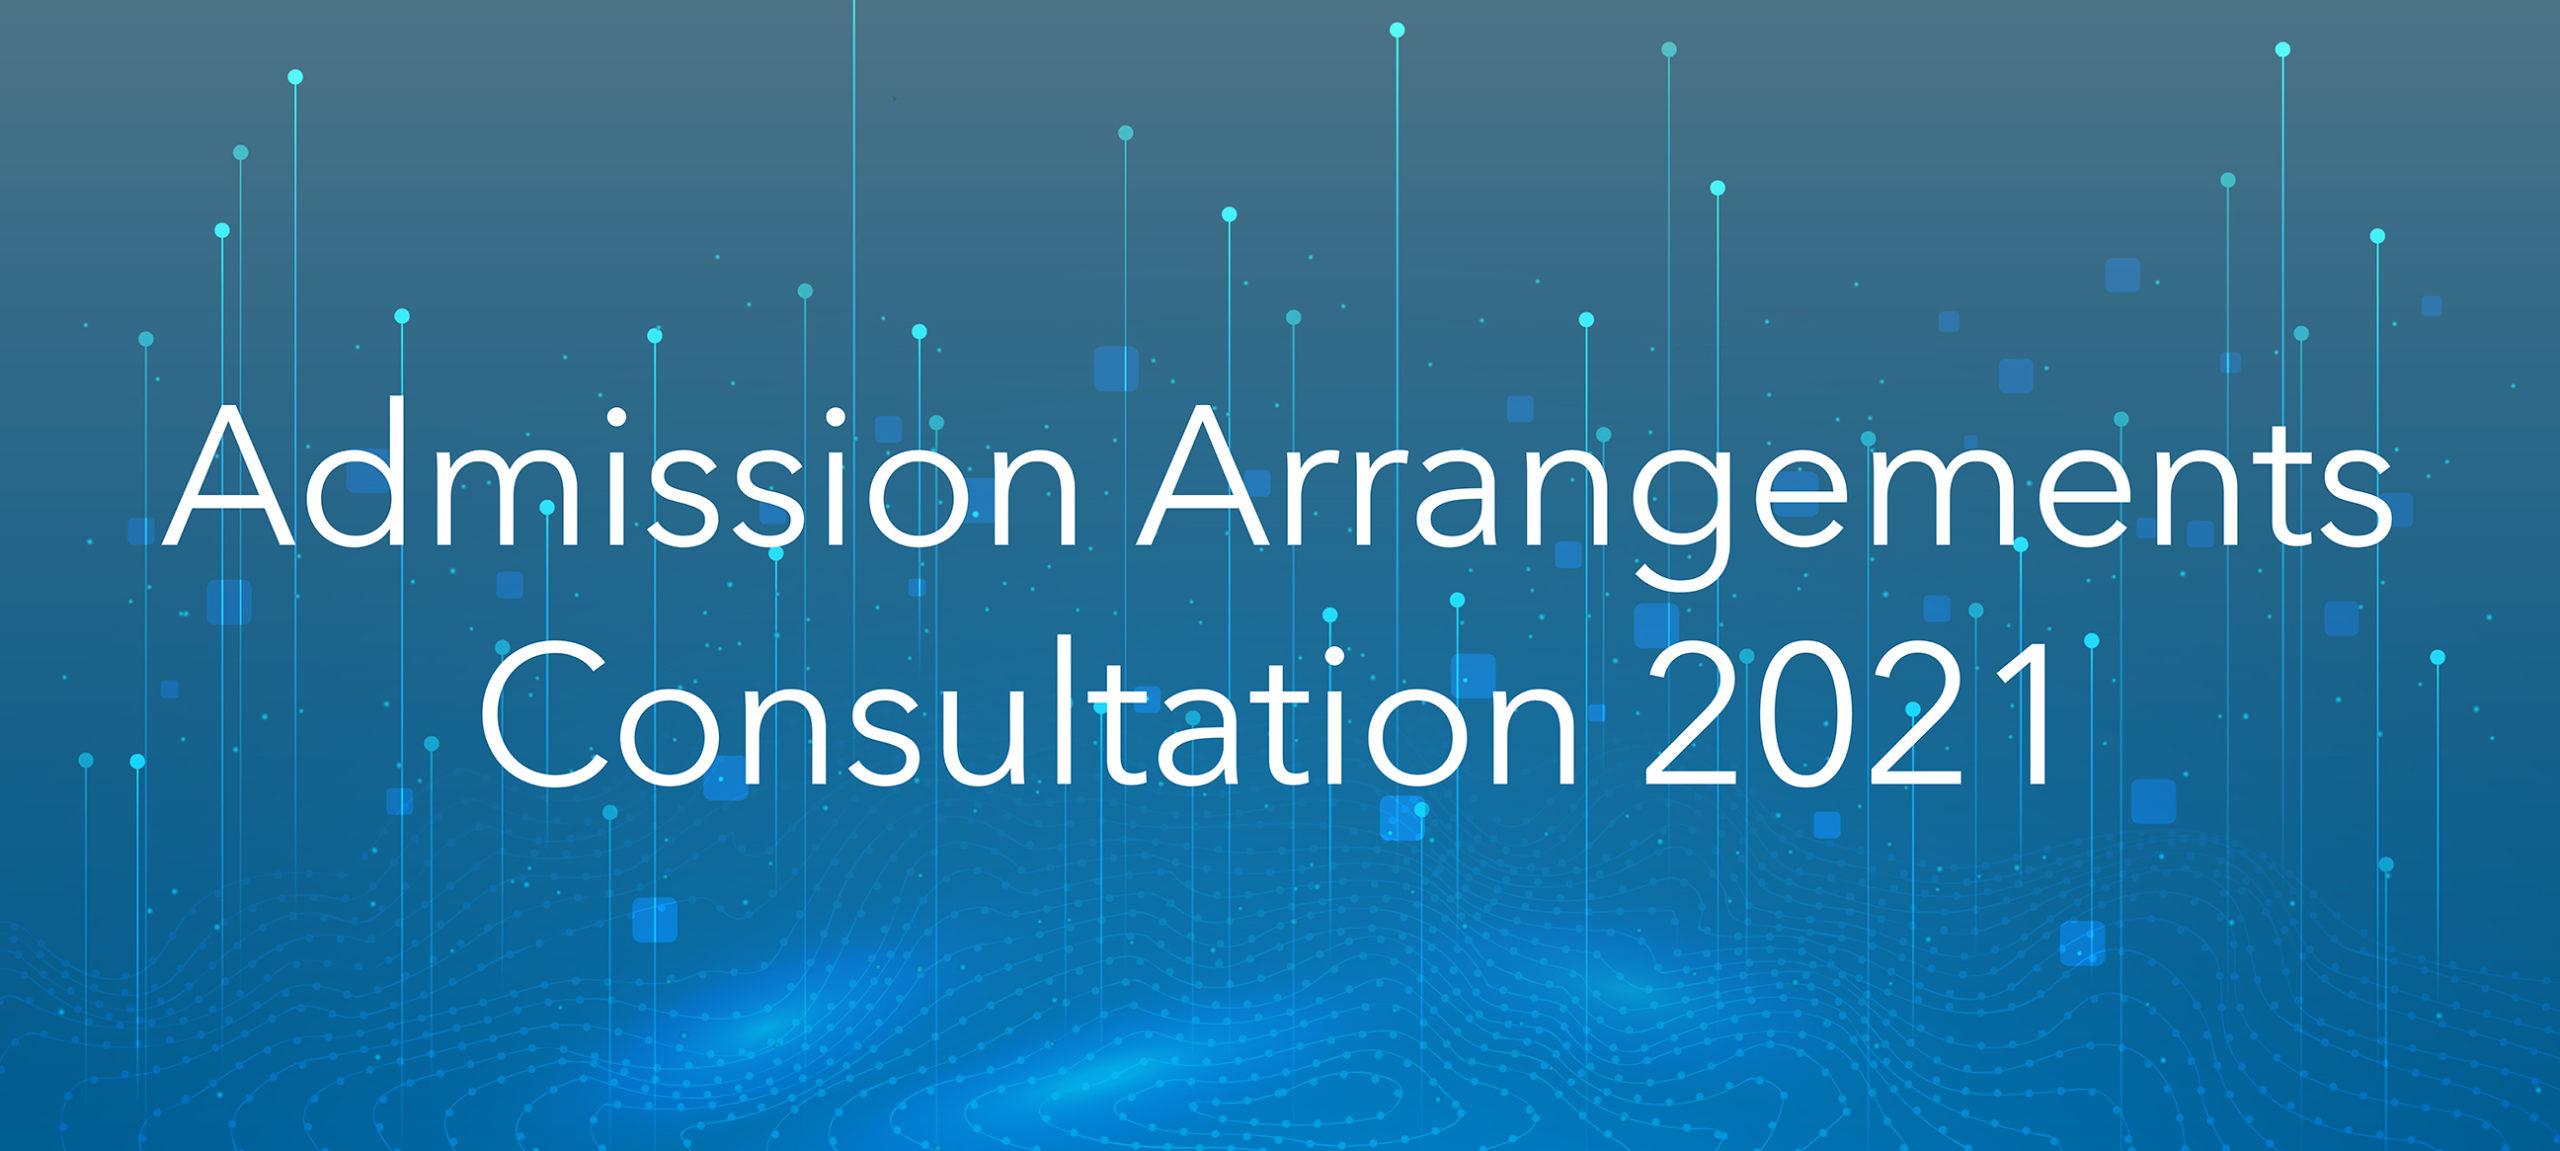 Admission Arrangements Consultation 2021